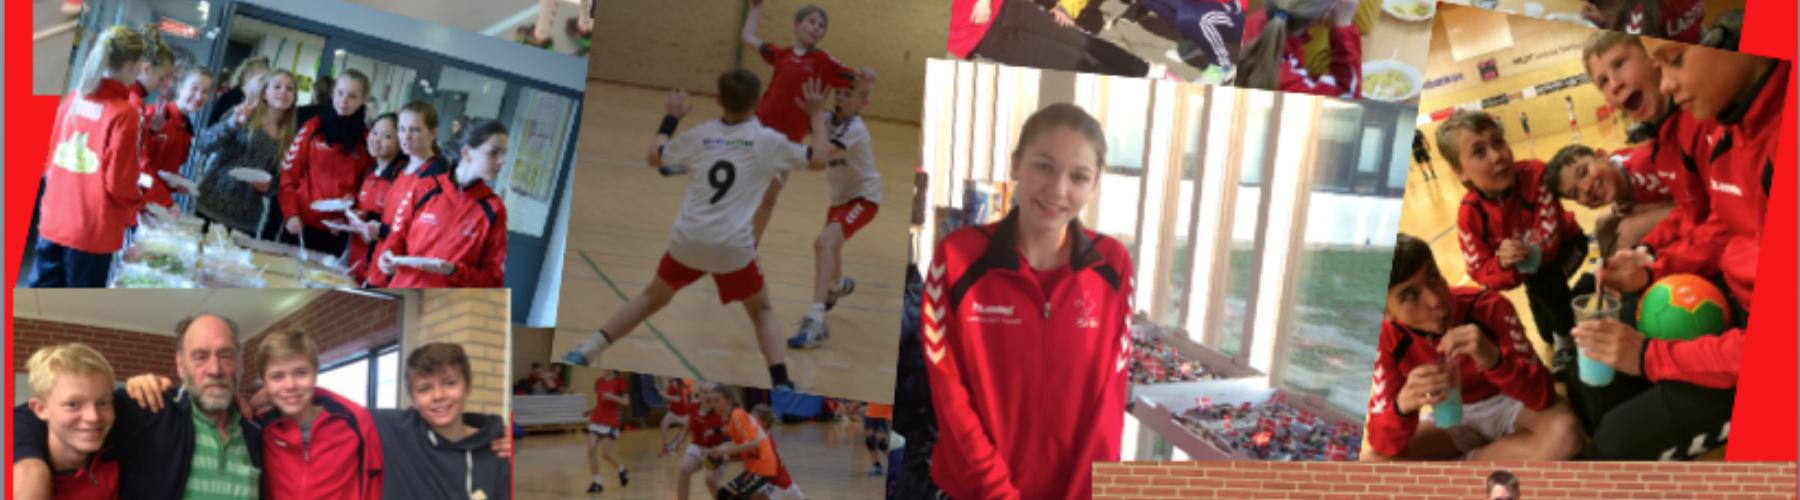 Stige Håndboldklub cover image